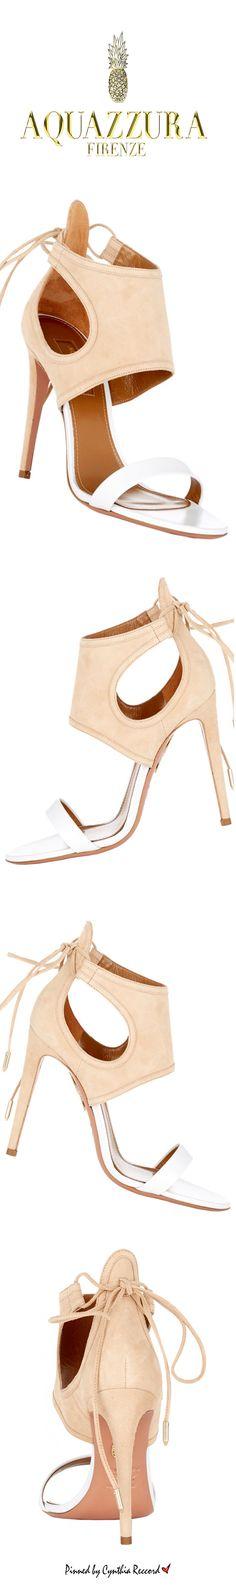 Aquazzura ~ White Leather + Tan Suede Sandals for Fall 2015 / cynthia reccord